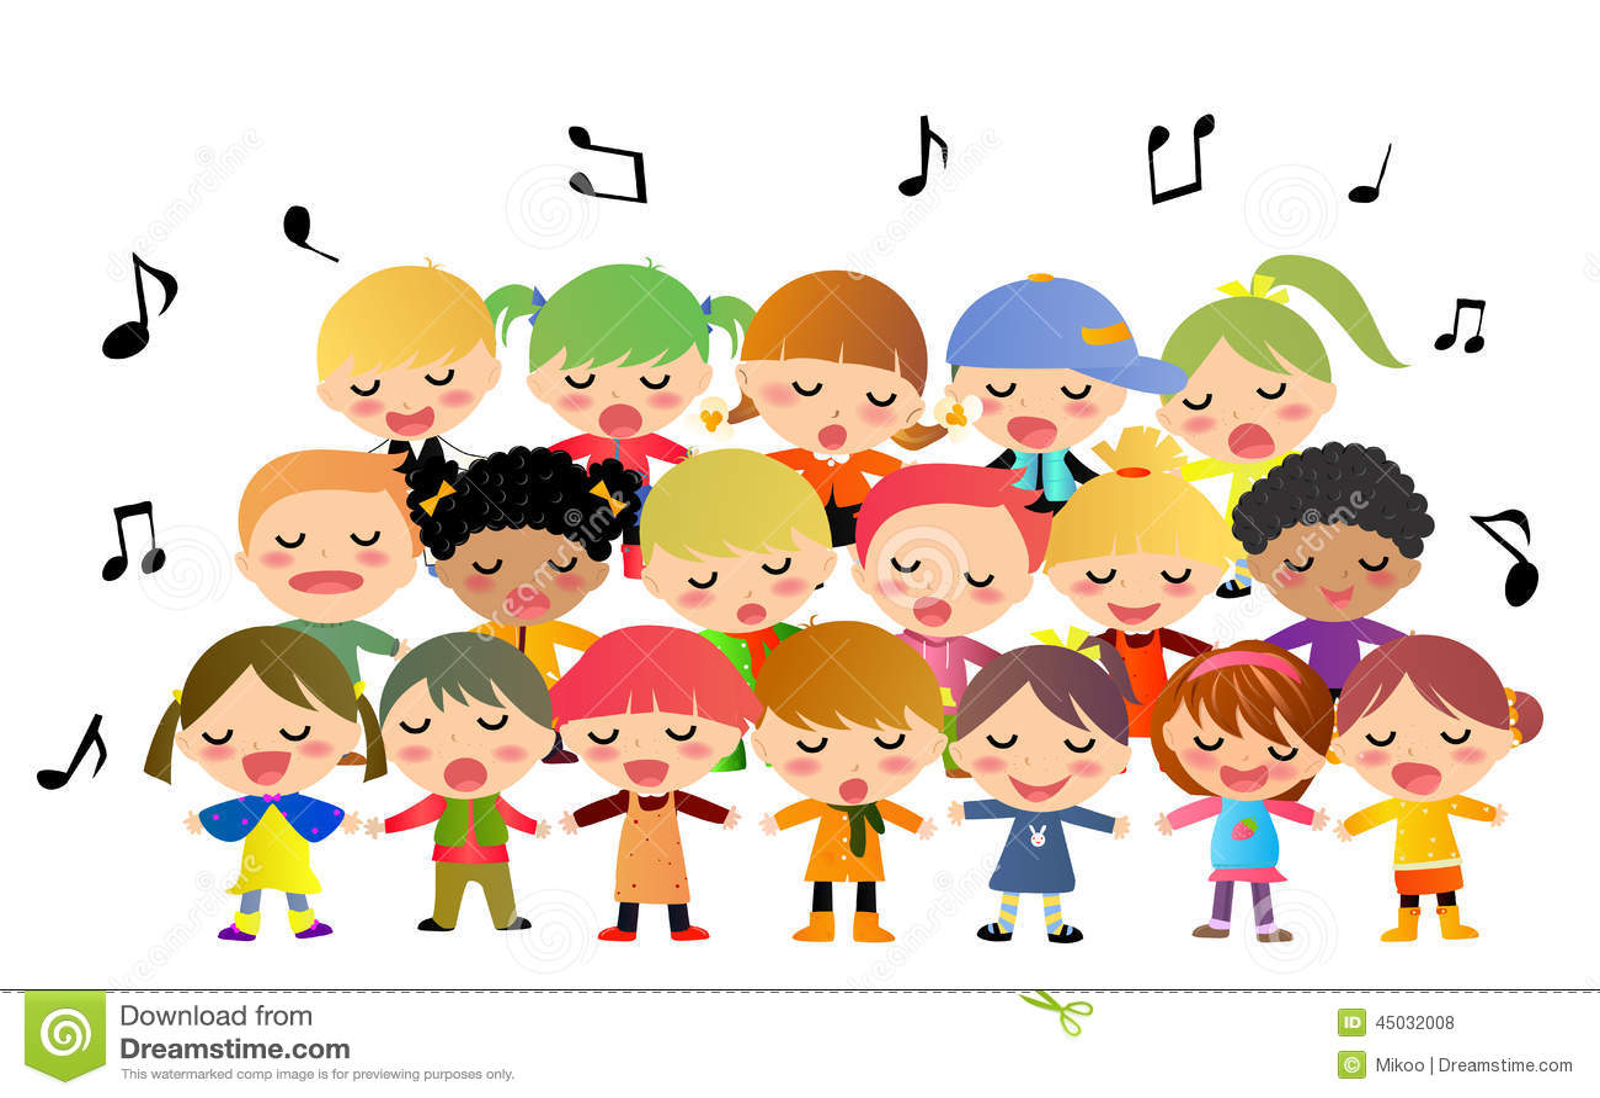 children choir singing stock vector illustration of Group Singing Clip Art clip art kid singing